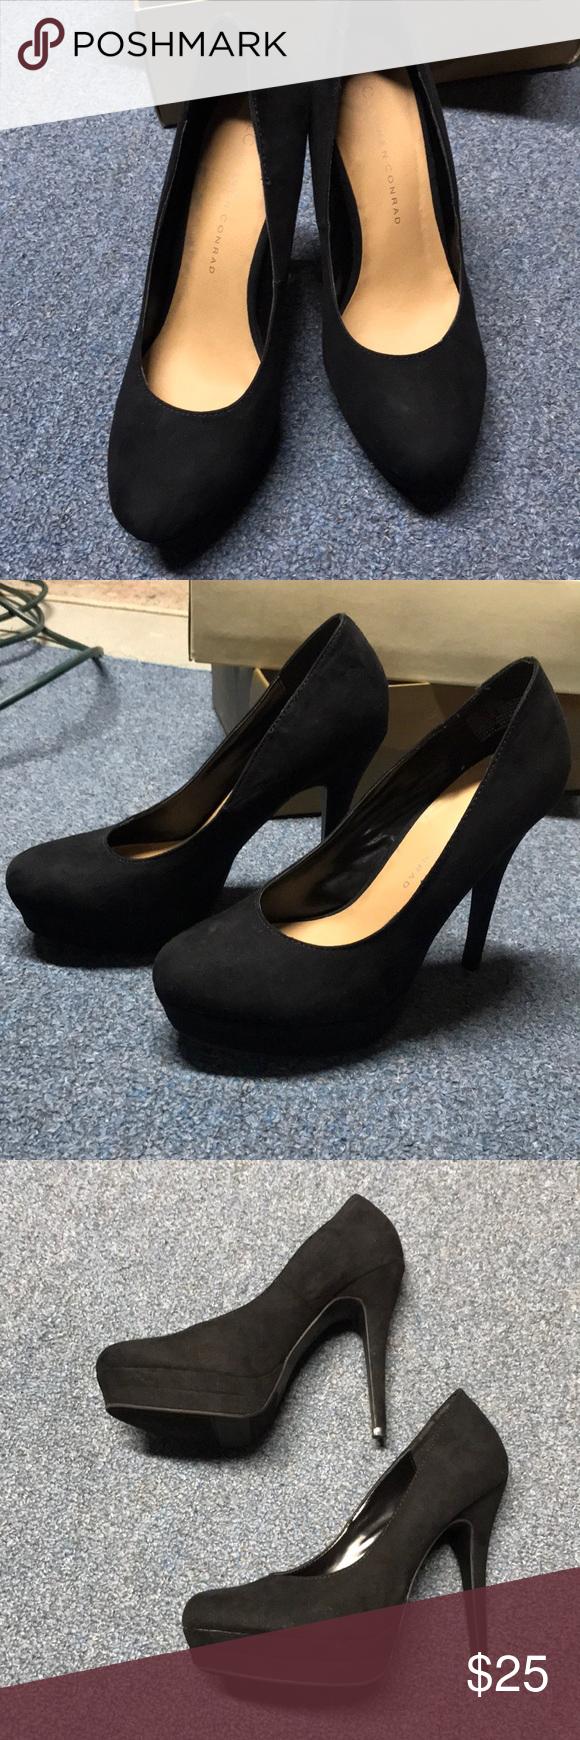 LC Lauren Conrad Johanna Shoes Womens 7 Black Shiny